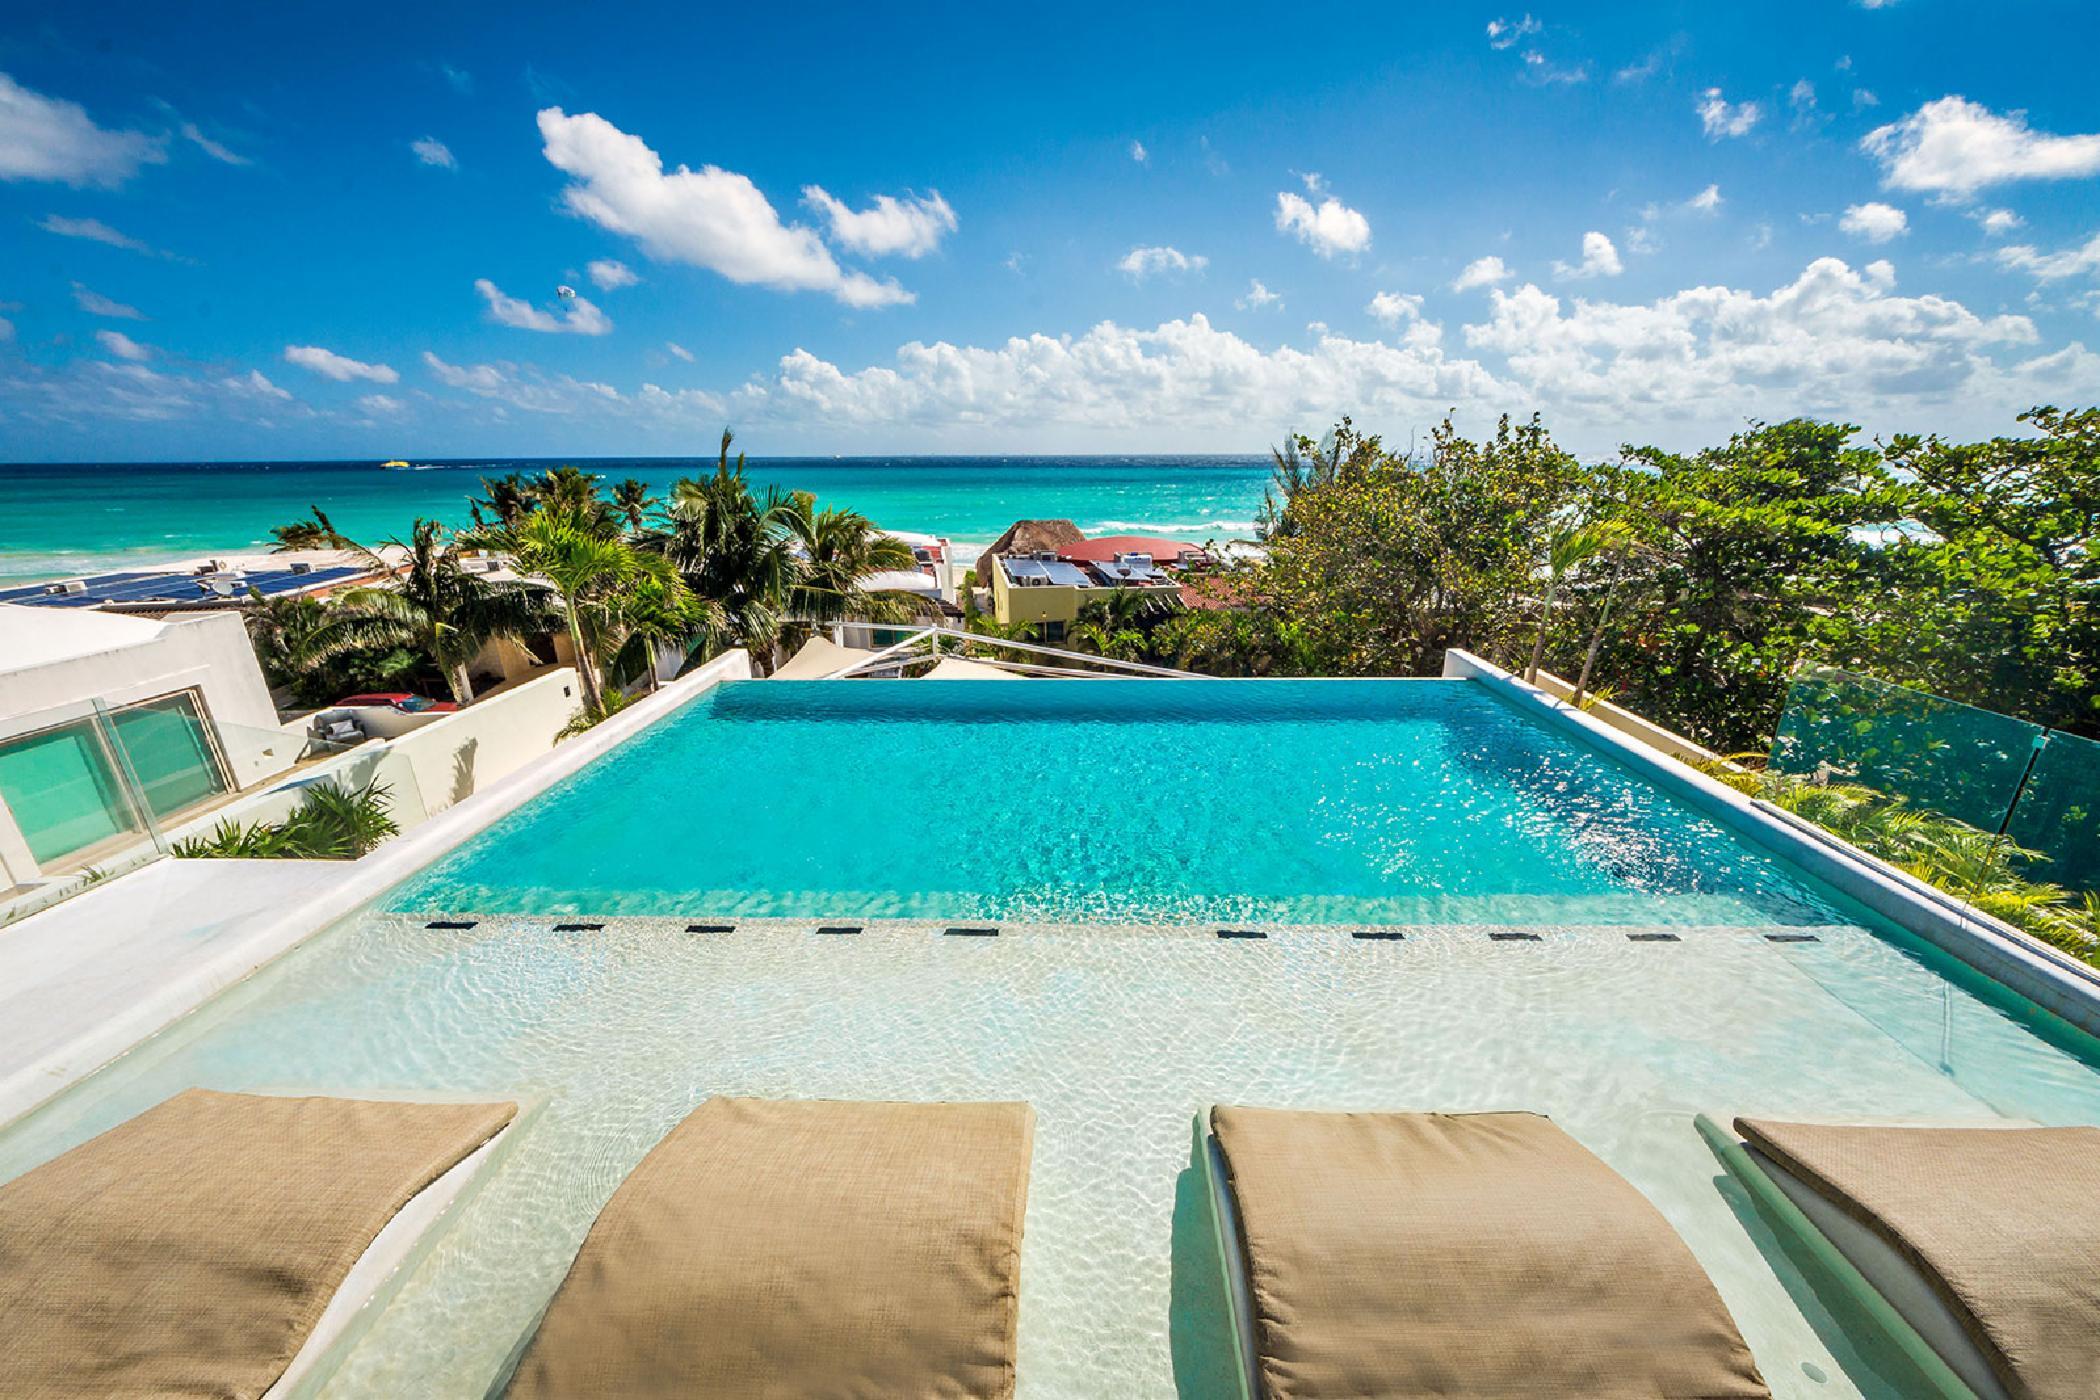 Maya_Luxe_Riviera_Maya_Luxury_Villas_Experiences_Vista_Hermosa_15.jpg